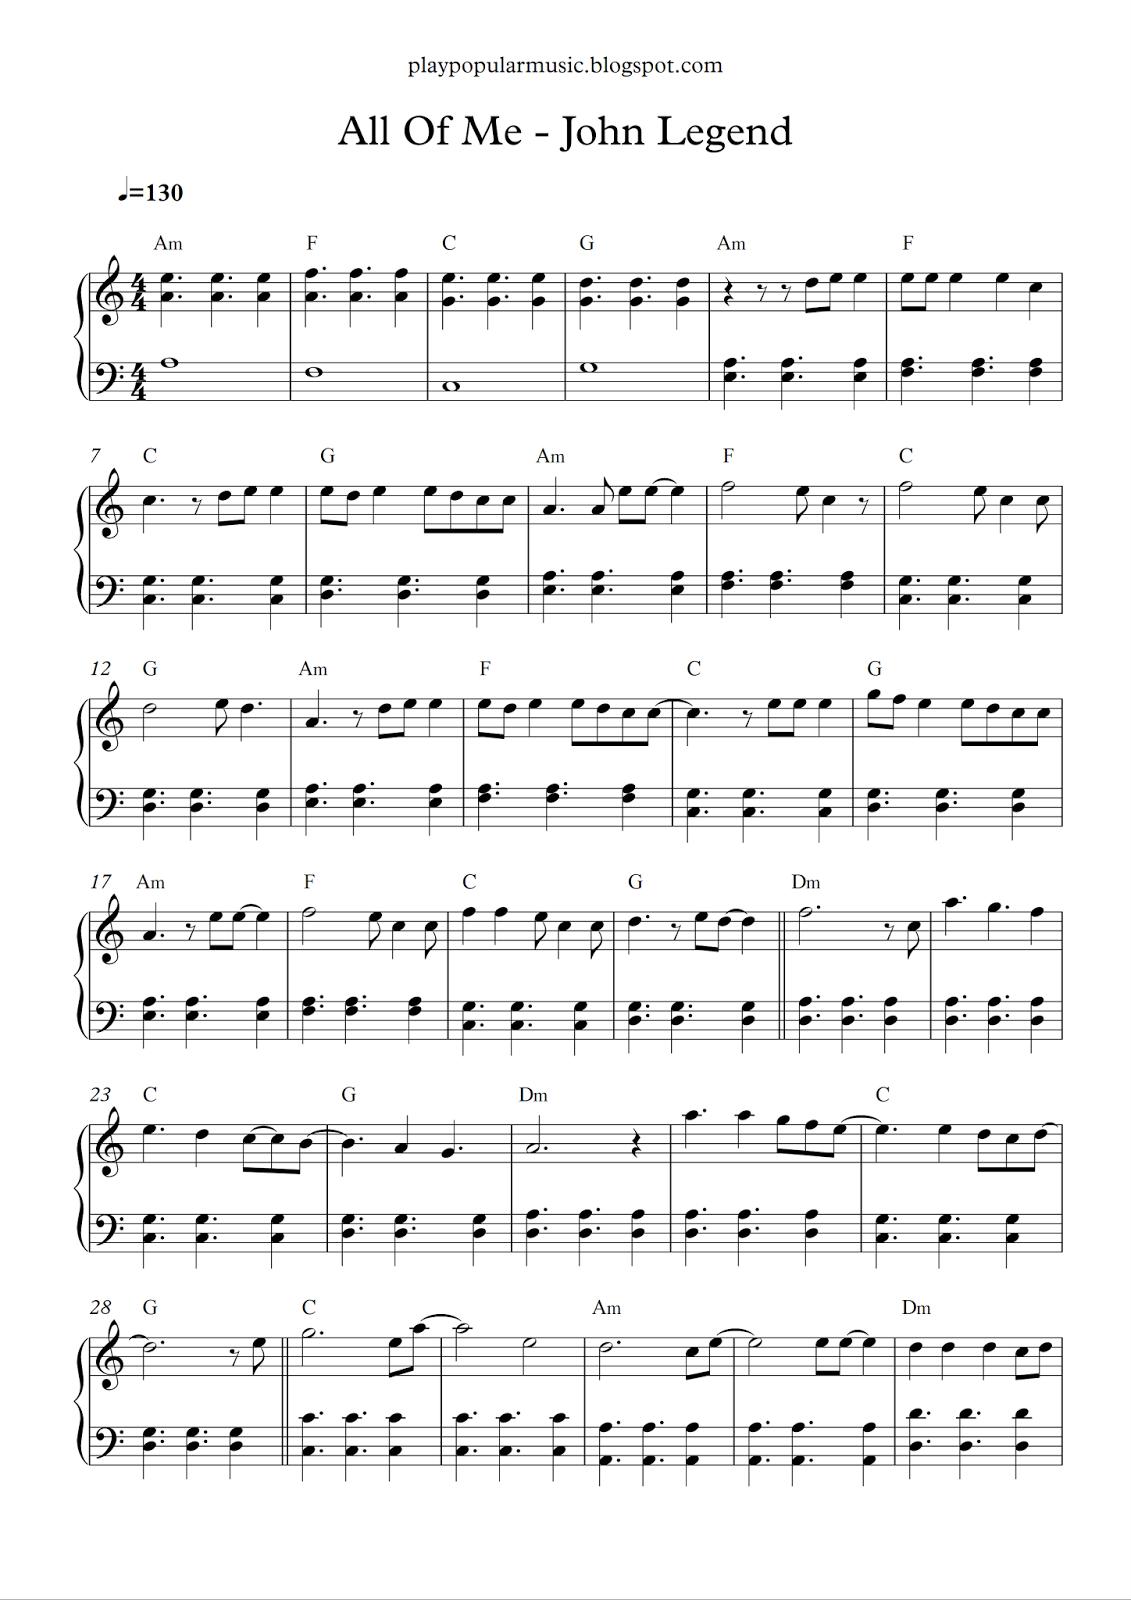 Free Piano Sheet Music: All Of Me - John Legend.pdf What's Going On - Free Piano Sheet Music Online Printable Popular Songs